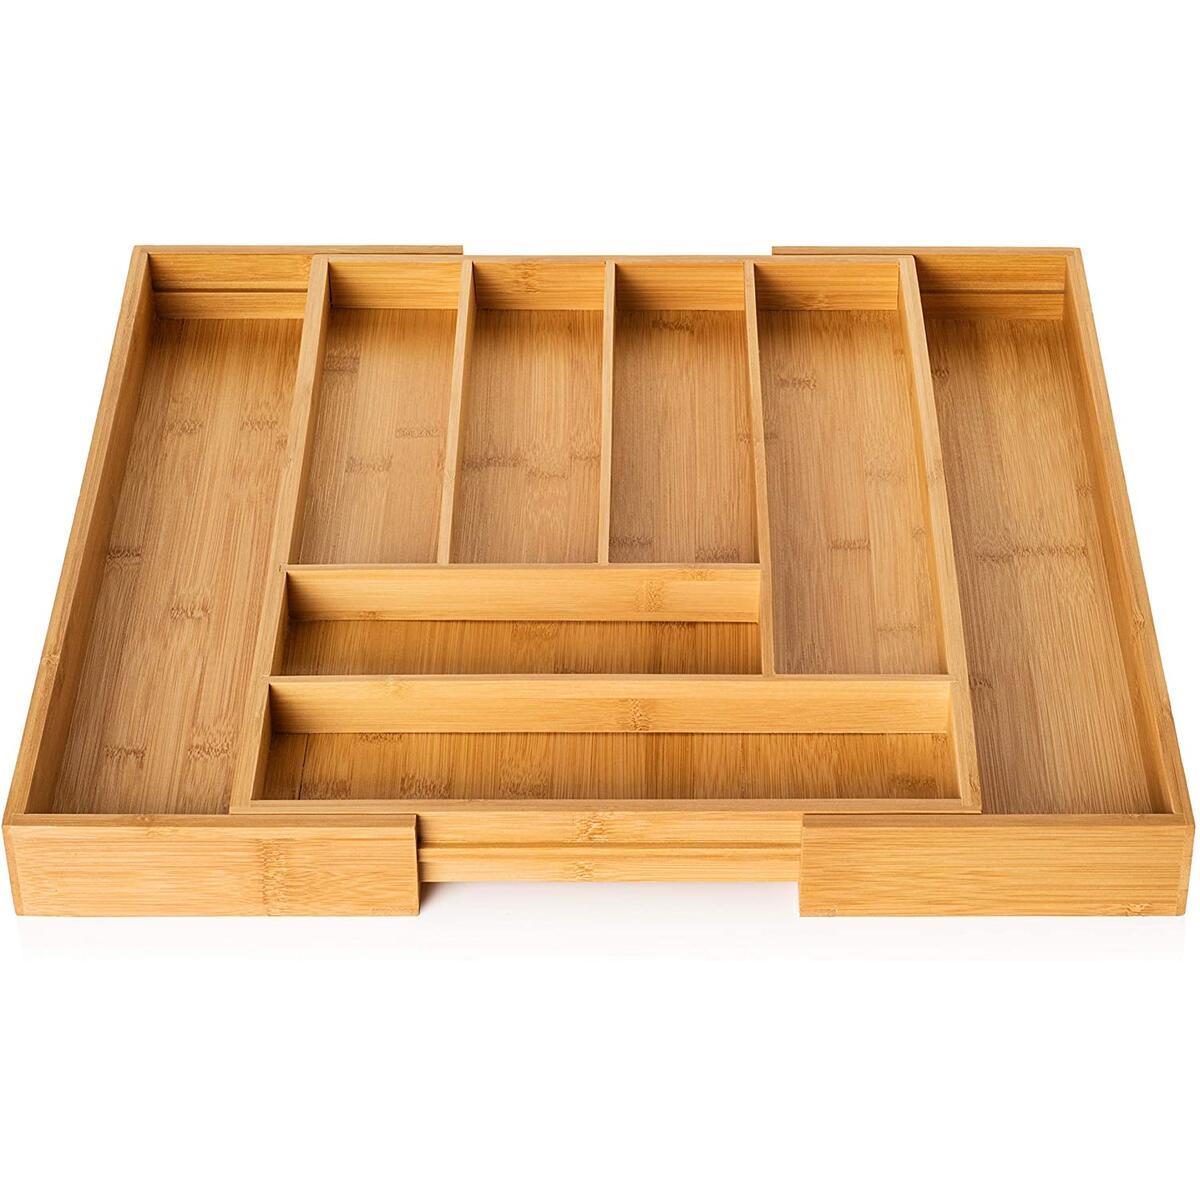 Bamboo Silverware Drawer Organizer - Expandable 100% Bamboo Cutlery Kitchen Drawer Organizer – Premium Wooden Utensil/Cutlery Tray for Kitchen Flatware Set– Eco-Friendly Silverware Organizer